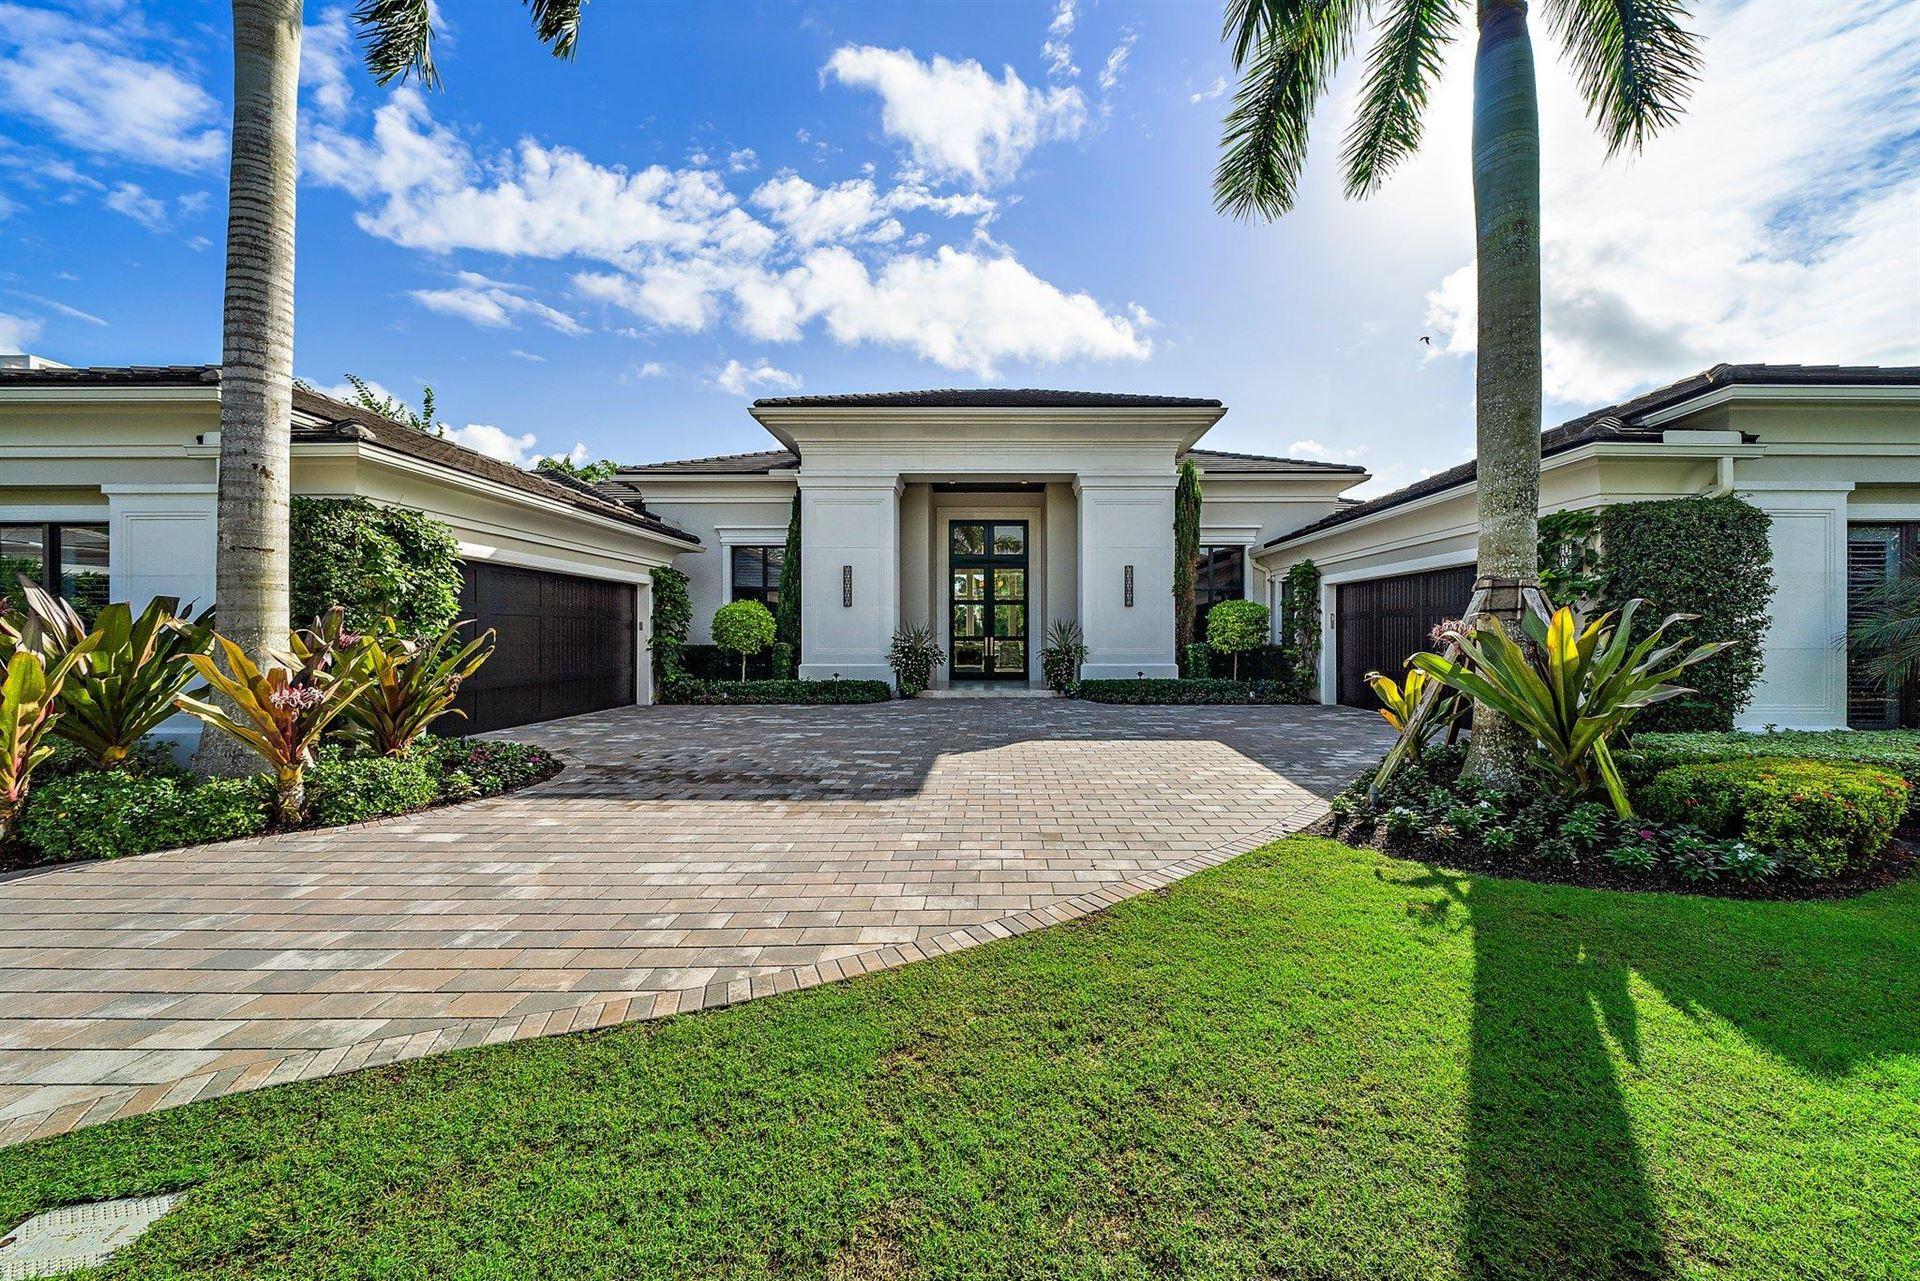 Photo of 12036 Corozo Court, Palm Beach Gardens, FL 33418 (MLS # RX-10666349)